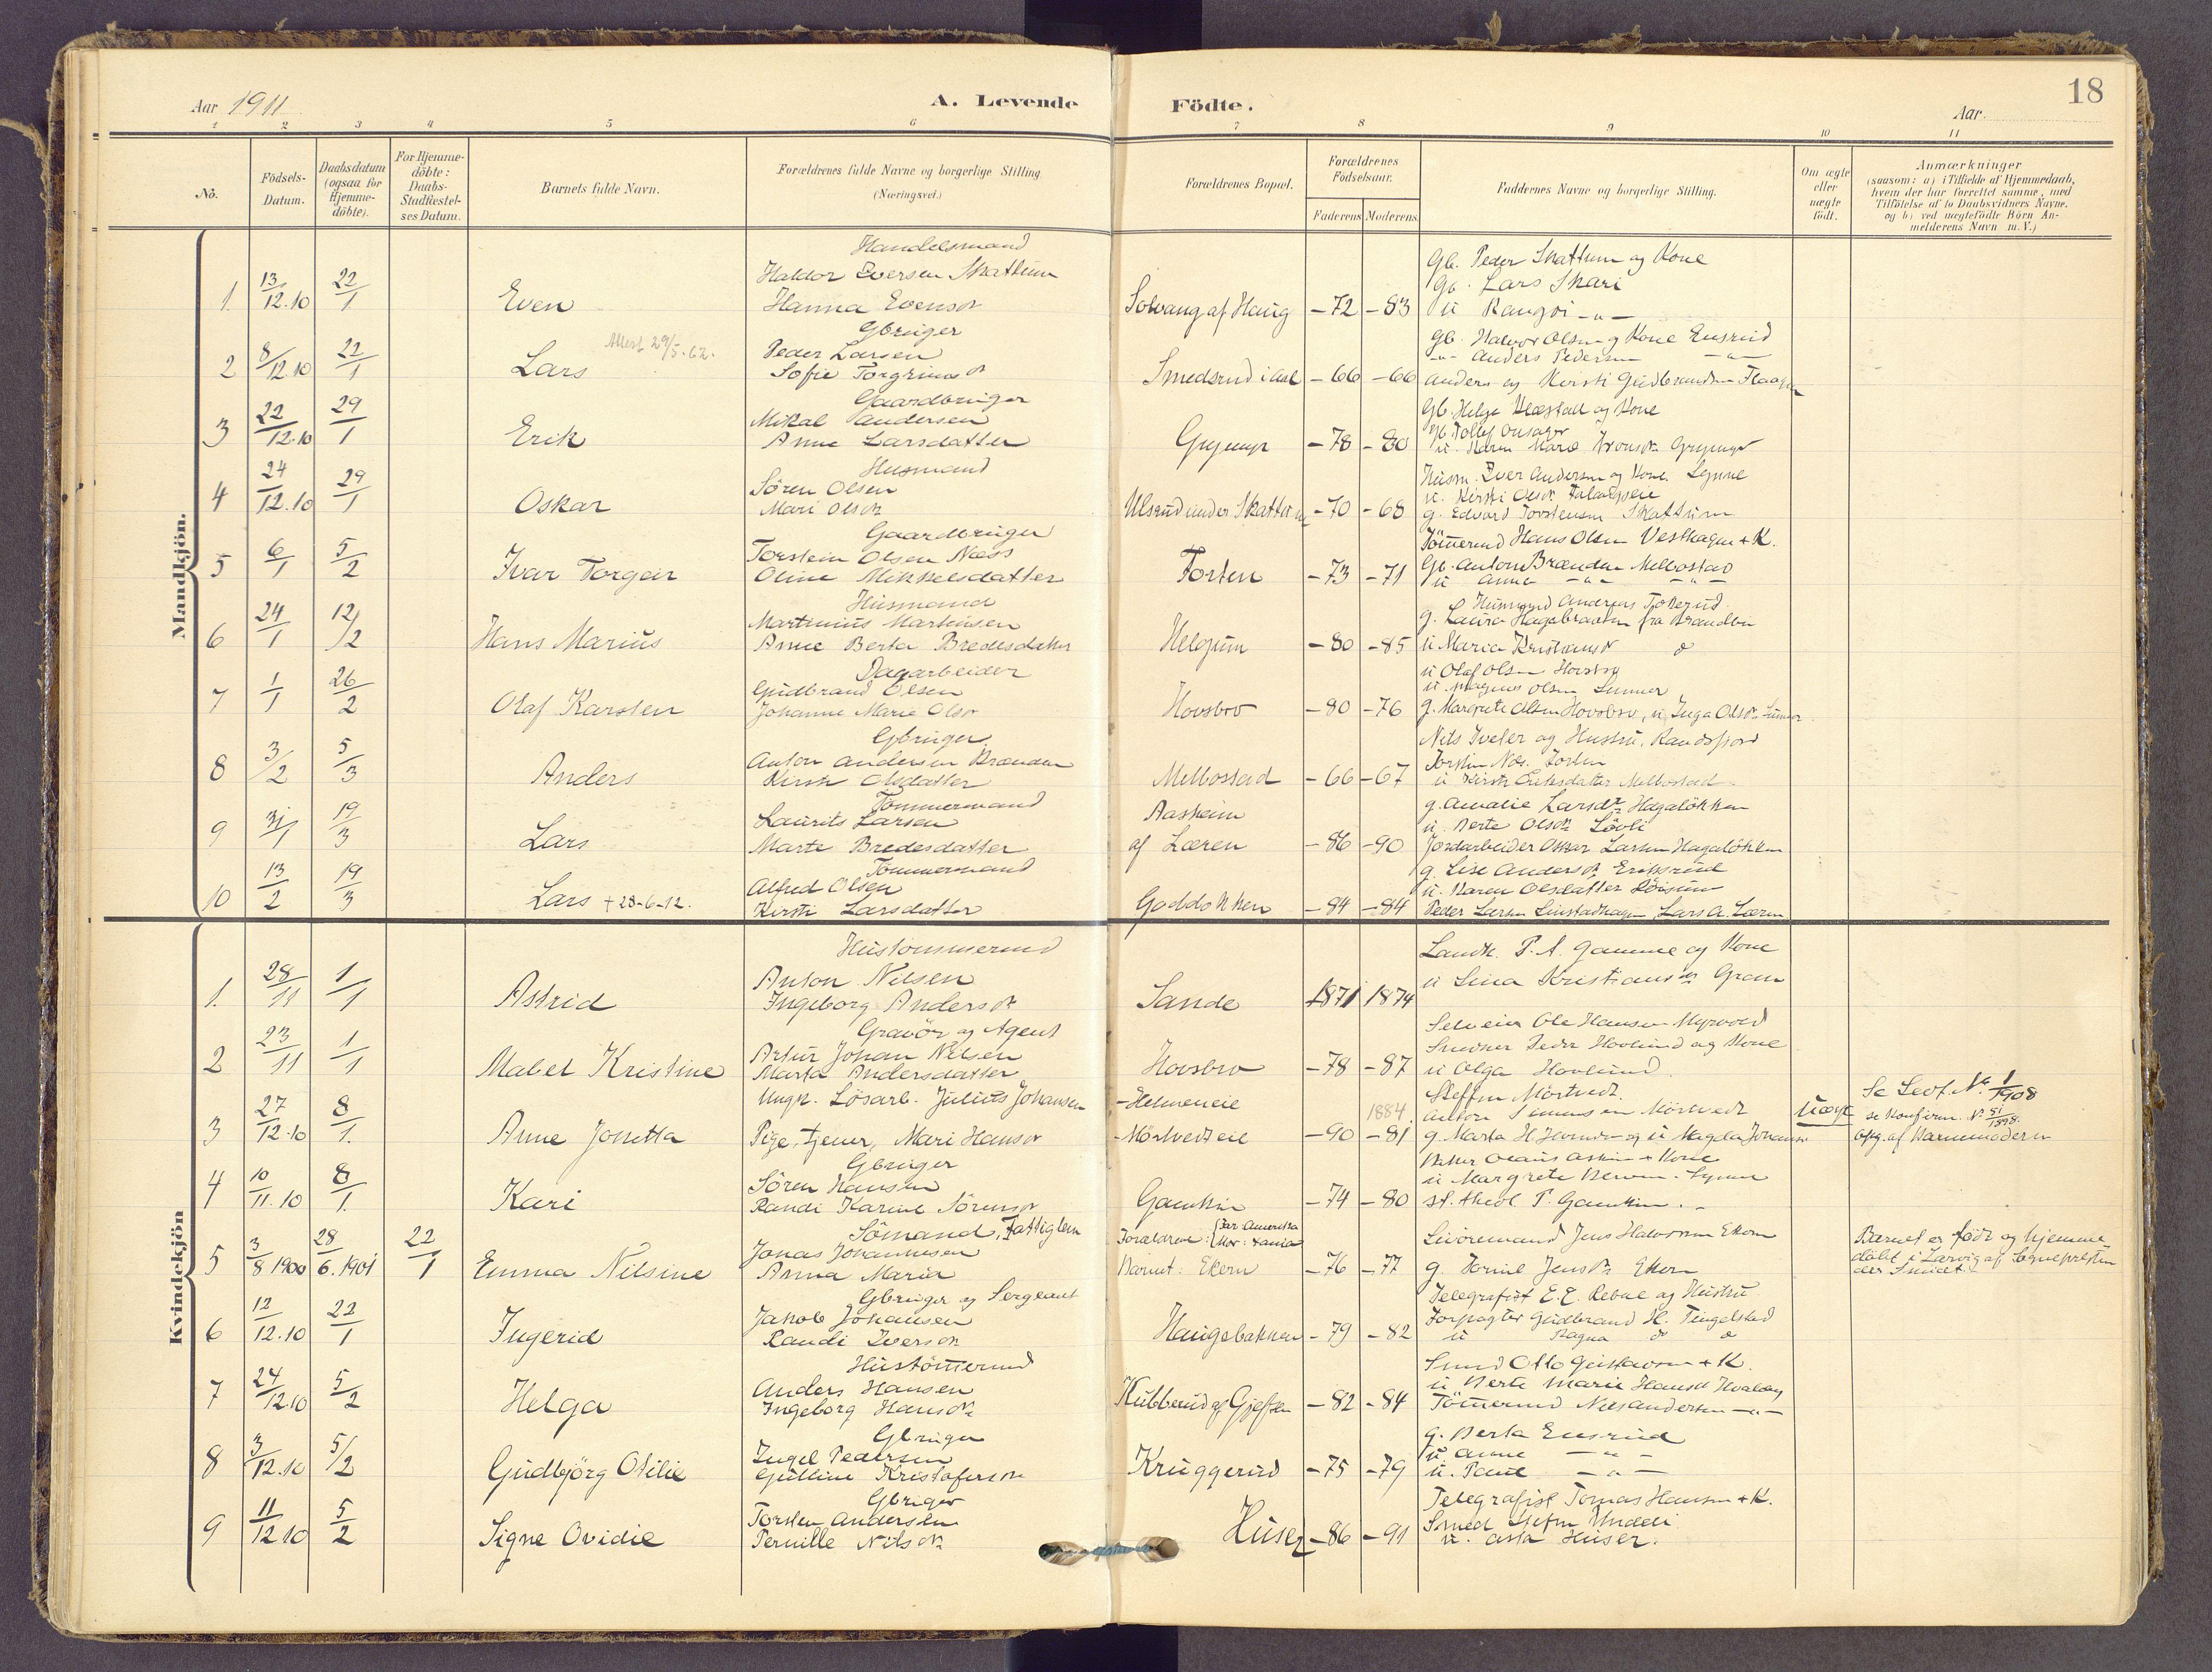 SAH, Gran prestekontor, Ministerialbok nr. 21, 1908-1932, s. 18